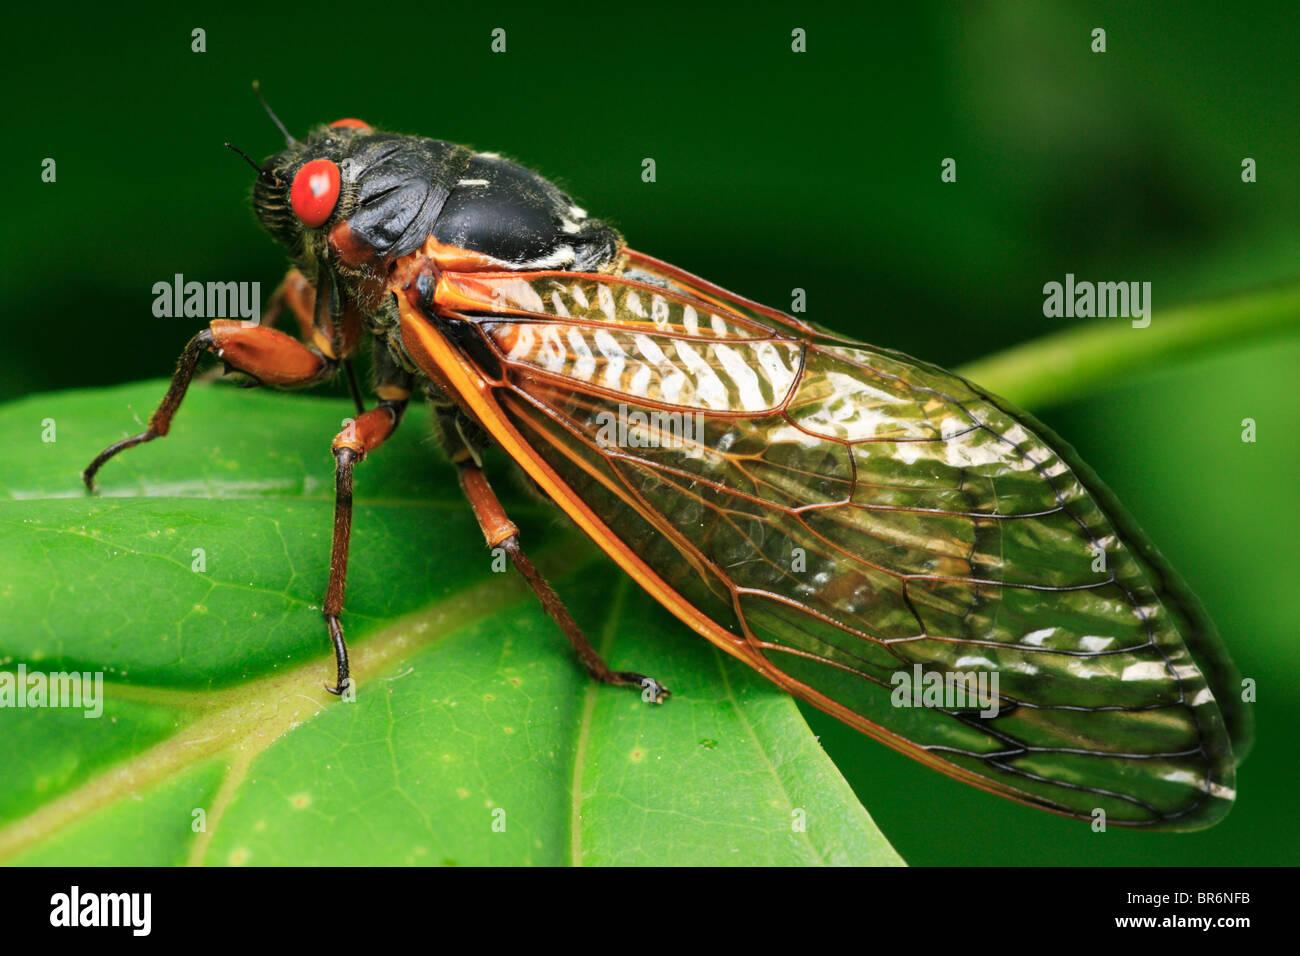 Macro view of a 17 year cycle Cicada, Brood X.   Washington, DC, USA - 2004. Stock Photo